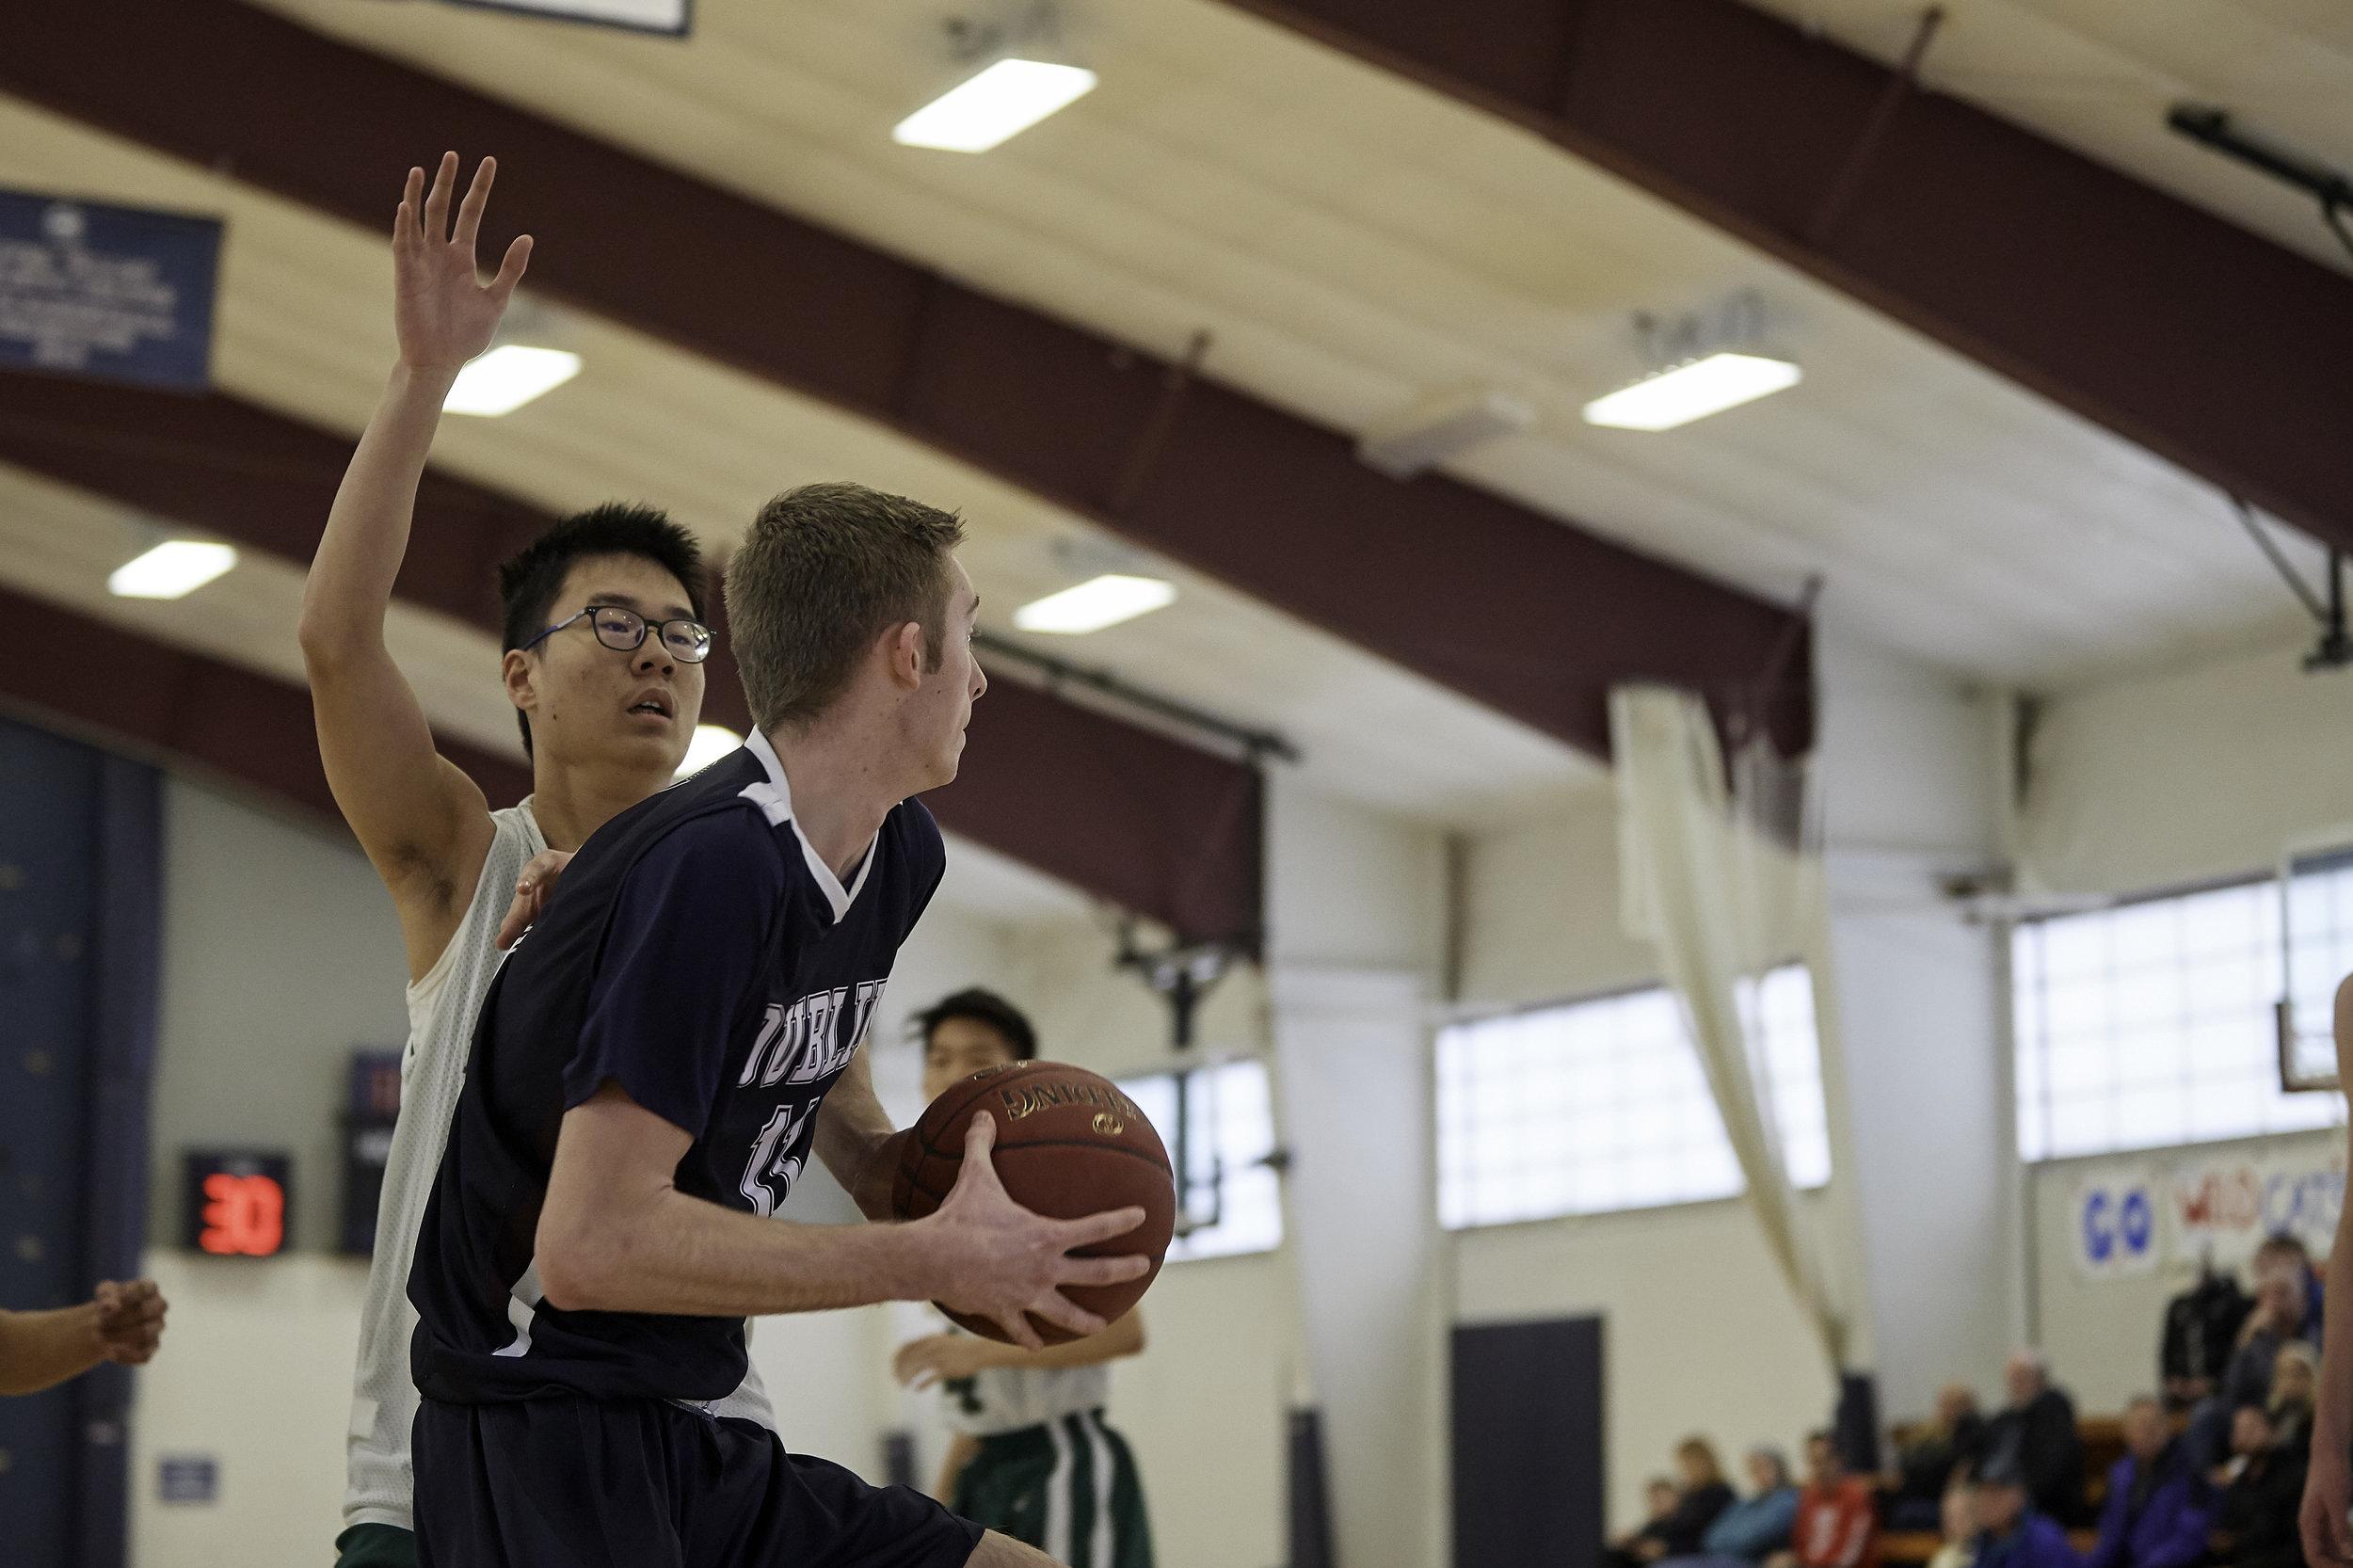 Boys Varsity Basketball vs High Mowing School - Feb 02 2019 - 0006.jpg